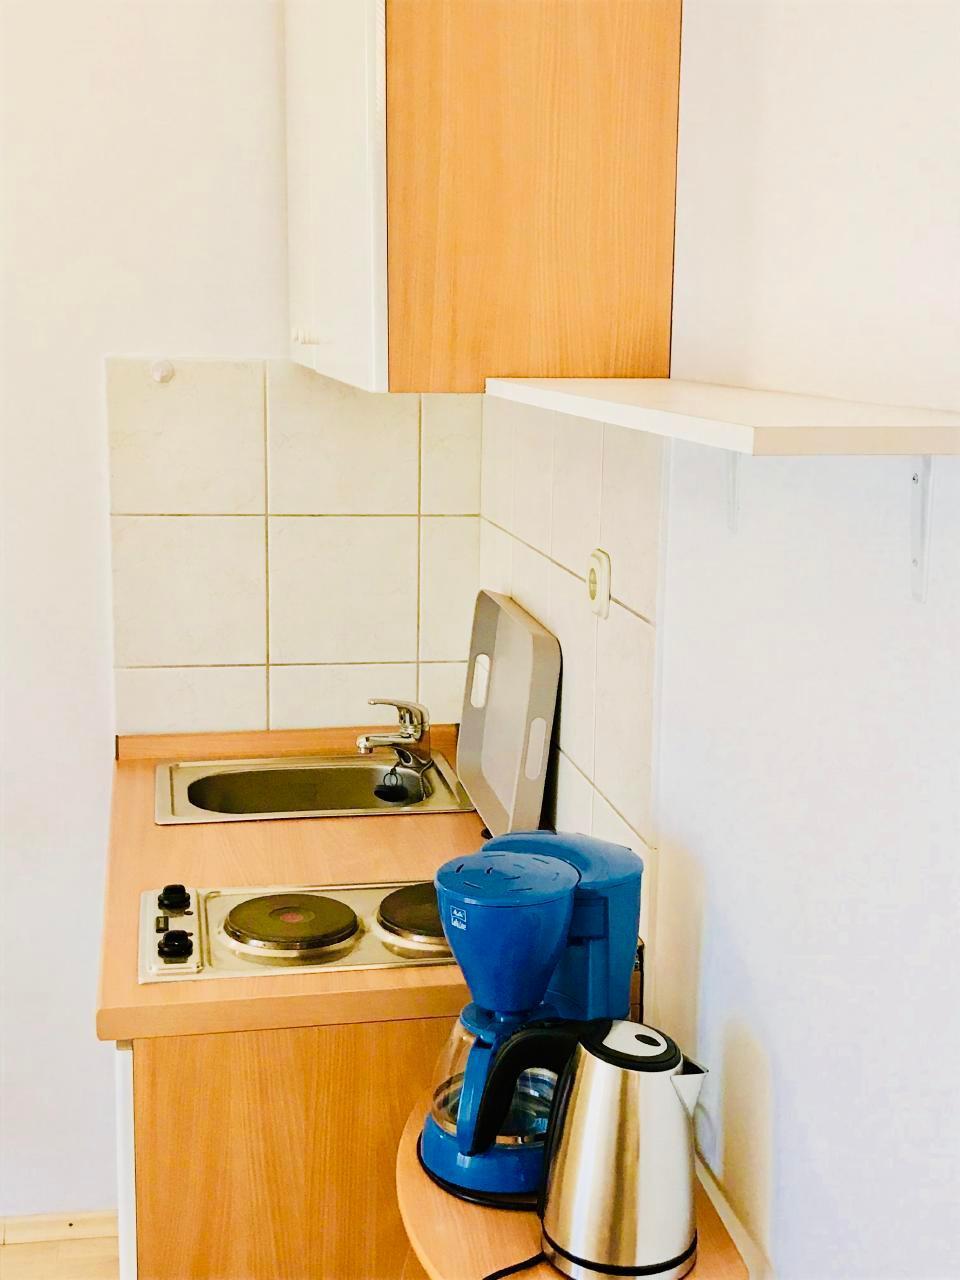 Ferienwohnung Apartmenthaus Ruza 1 - Studio (98389), Kaštel Štafilić, , Dalmatien, Kroatien, Bild 11